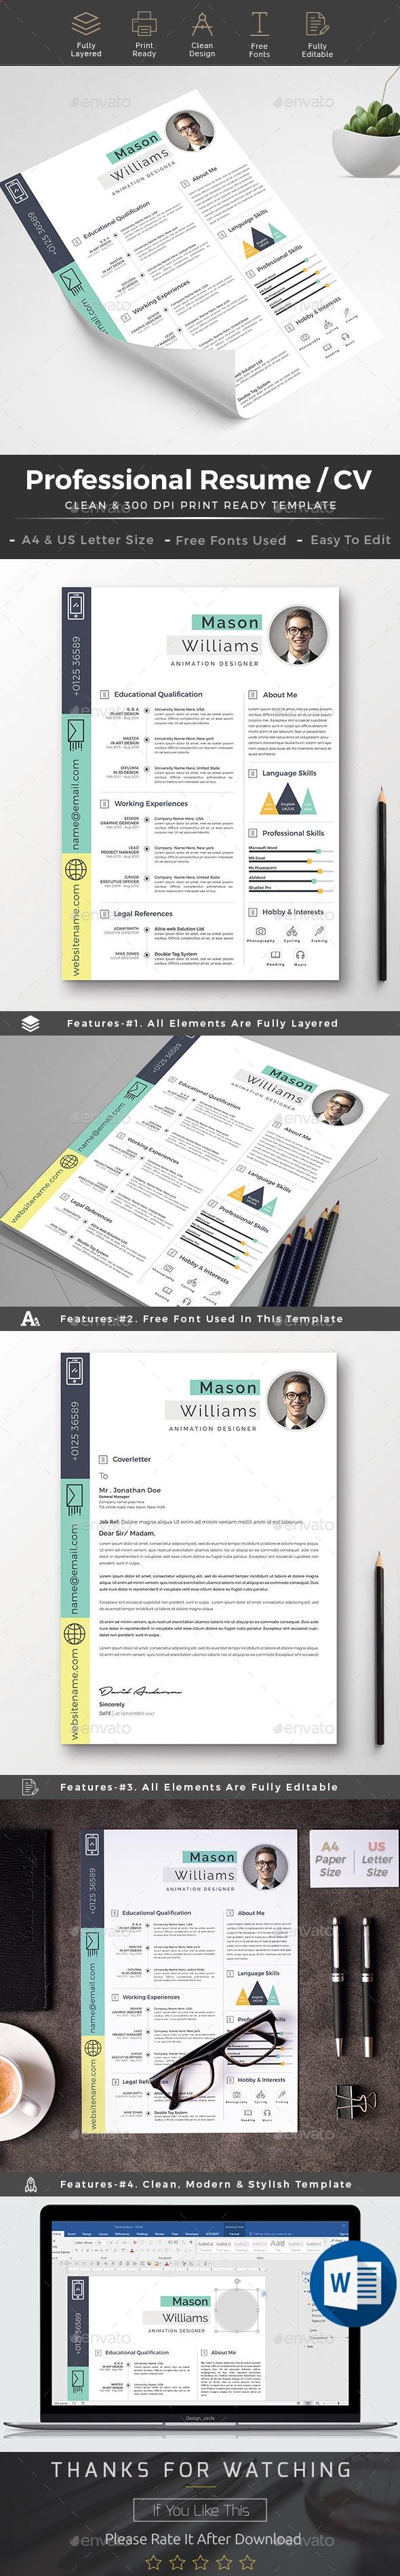 Resume  U2014 Photoshop Psd  Cover Letter  Resume Template  U2022 Download Graphicriver Net